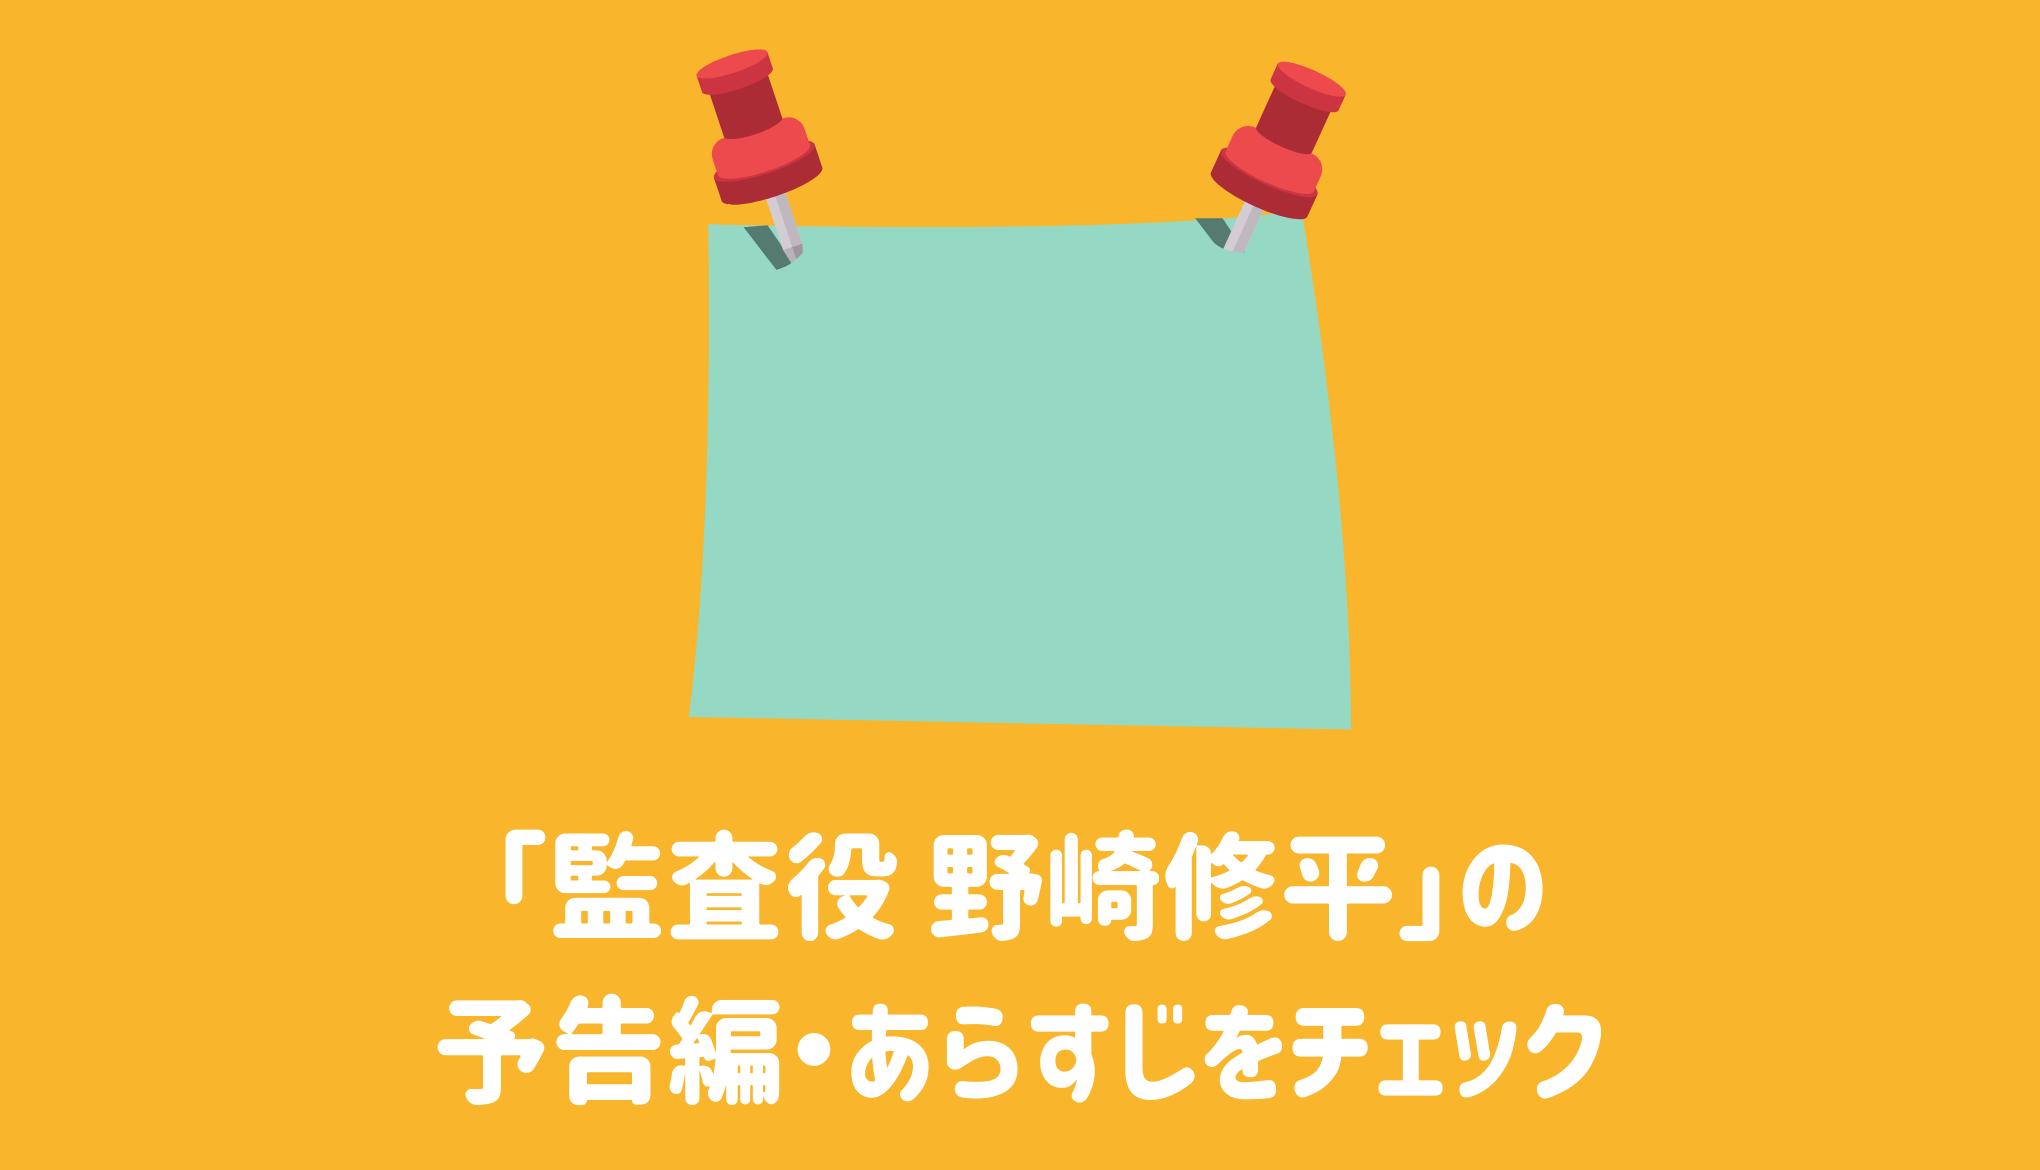 WOWOWオリジナルドラマ「監査役 野崎修平」の予告編・あらすじ